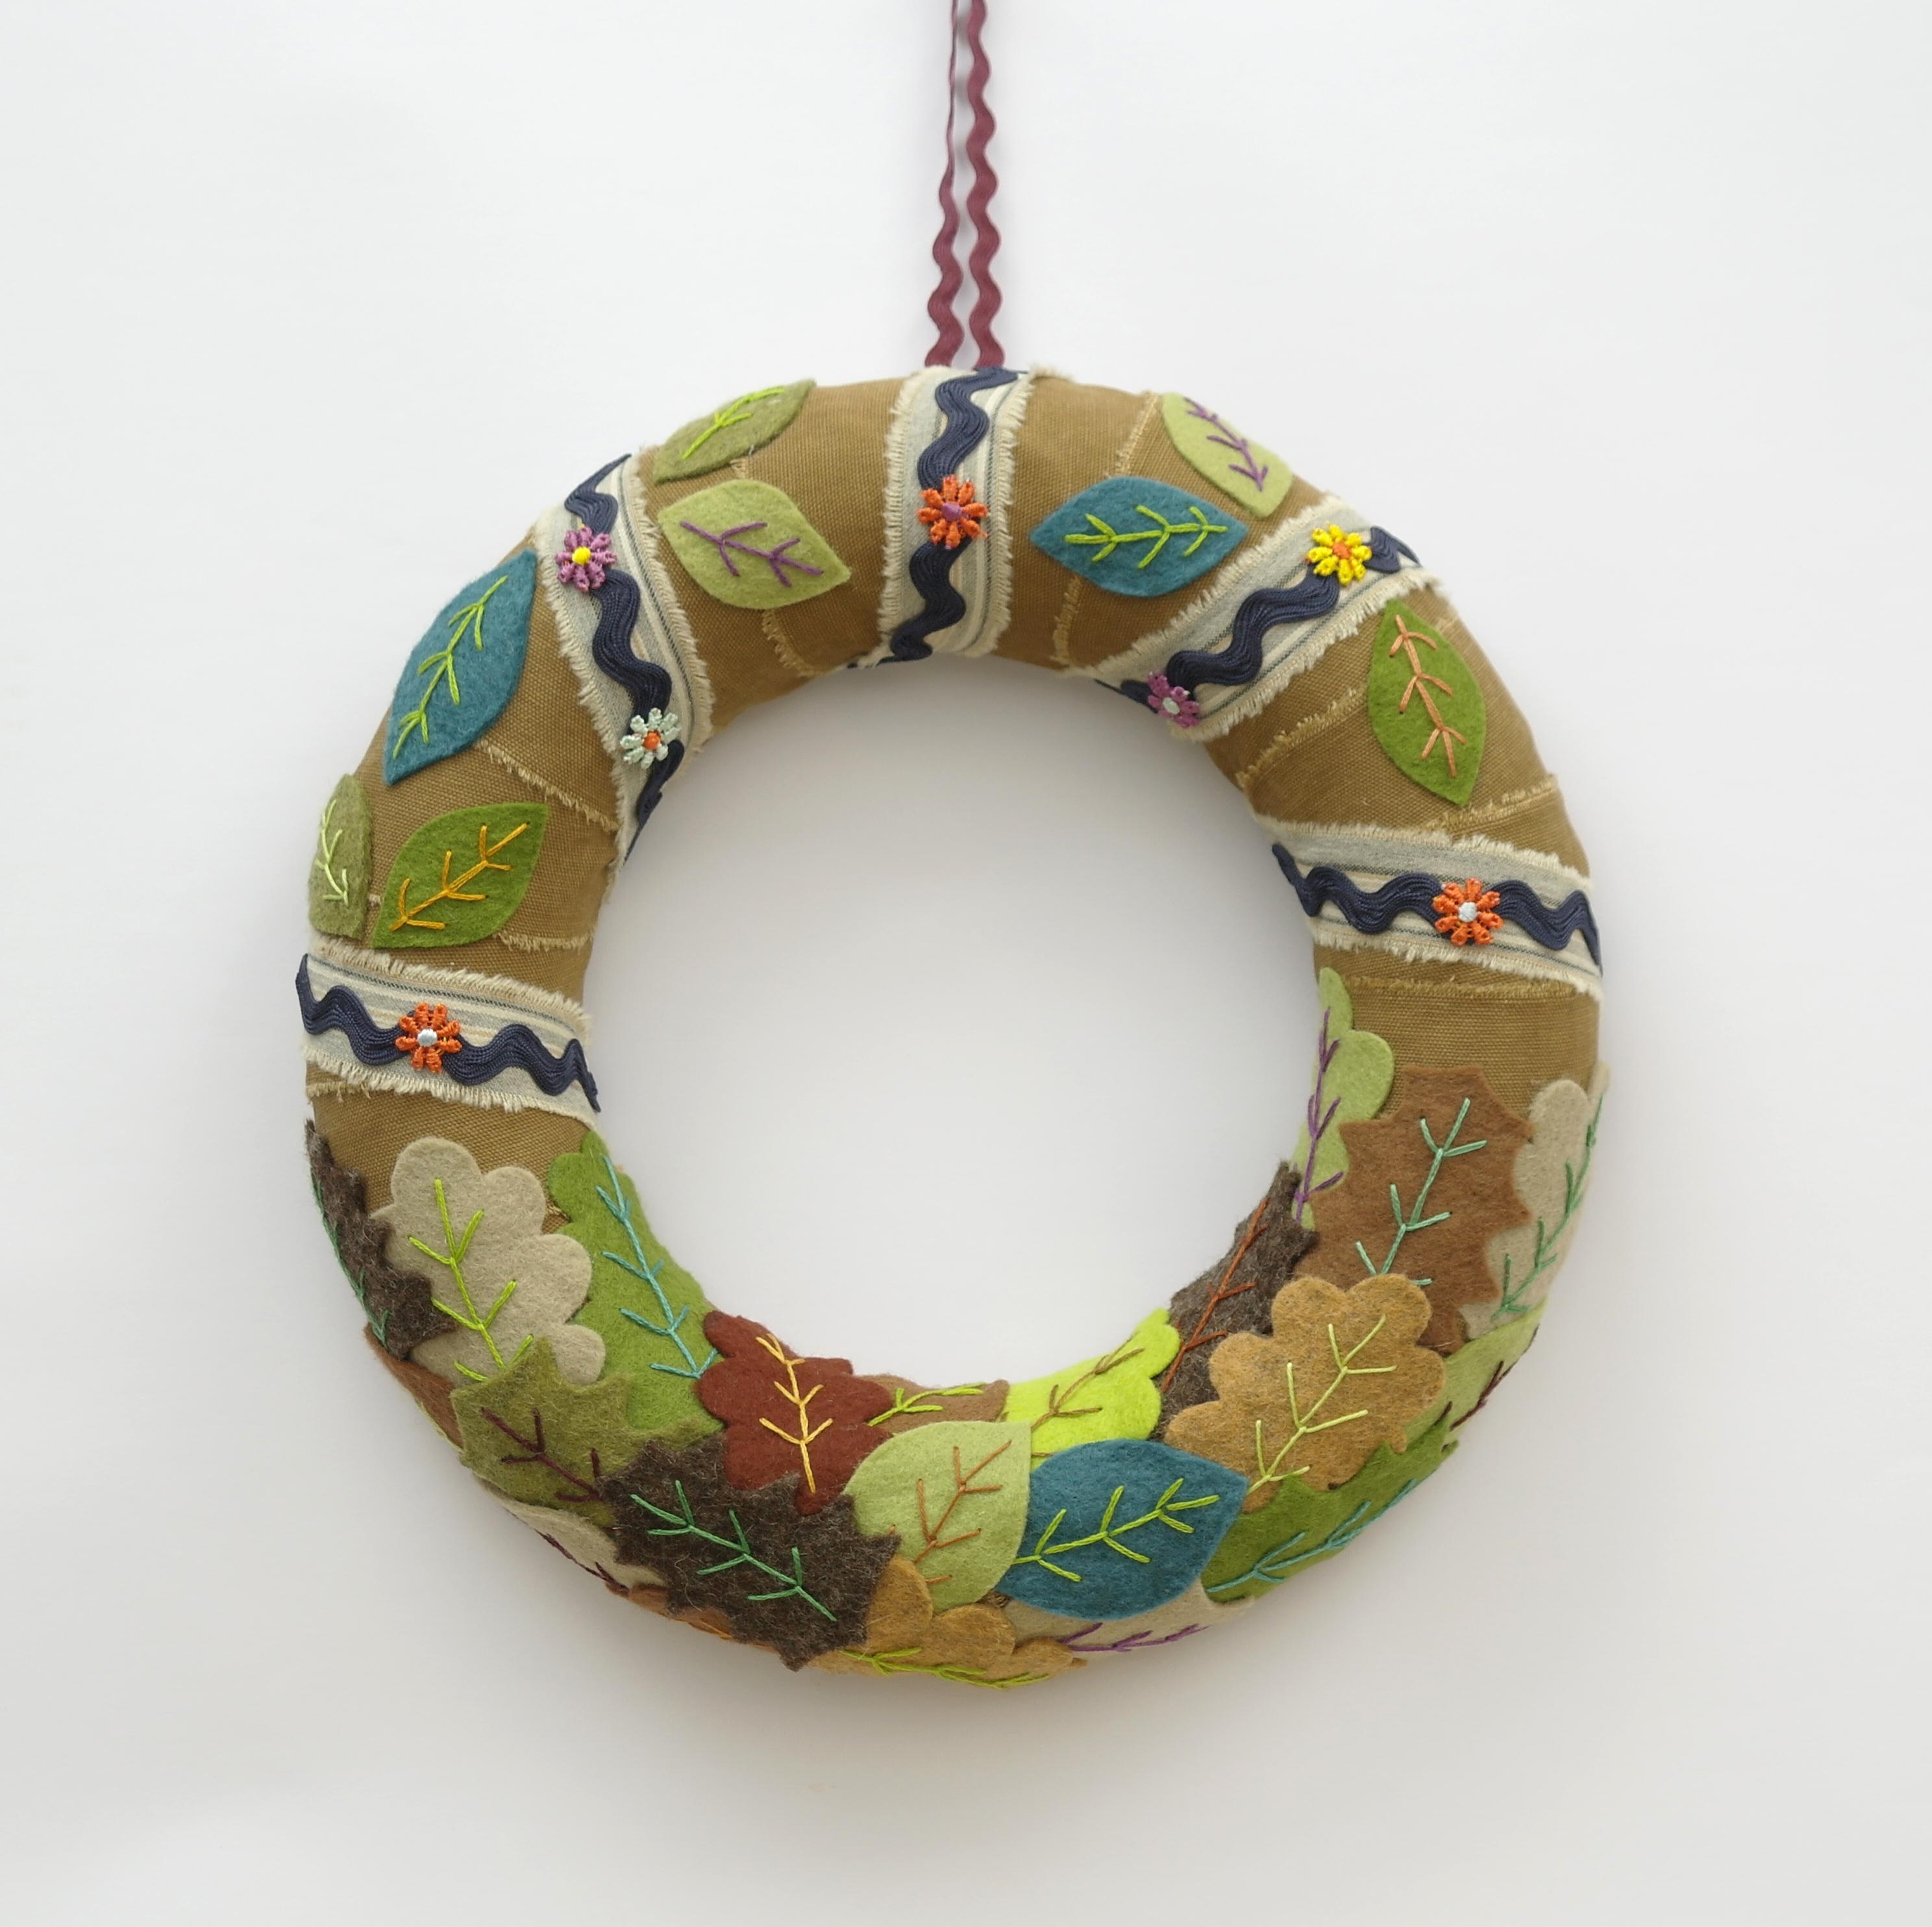 Christmas Stitched Garland/Wreath